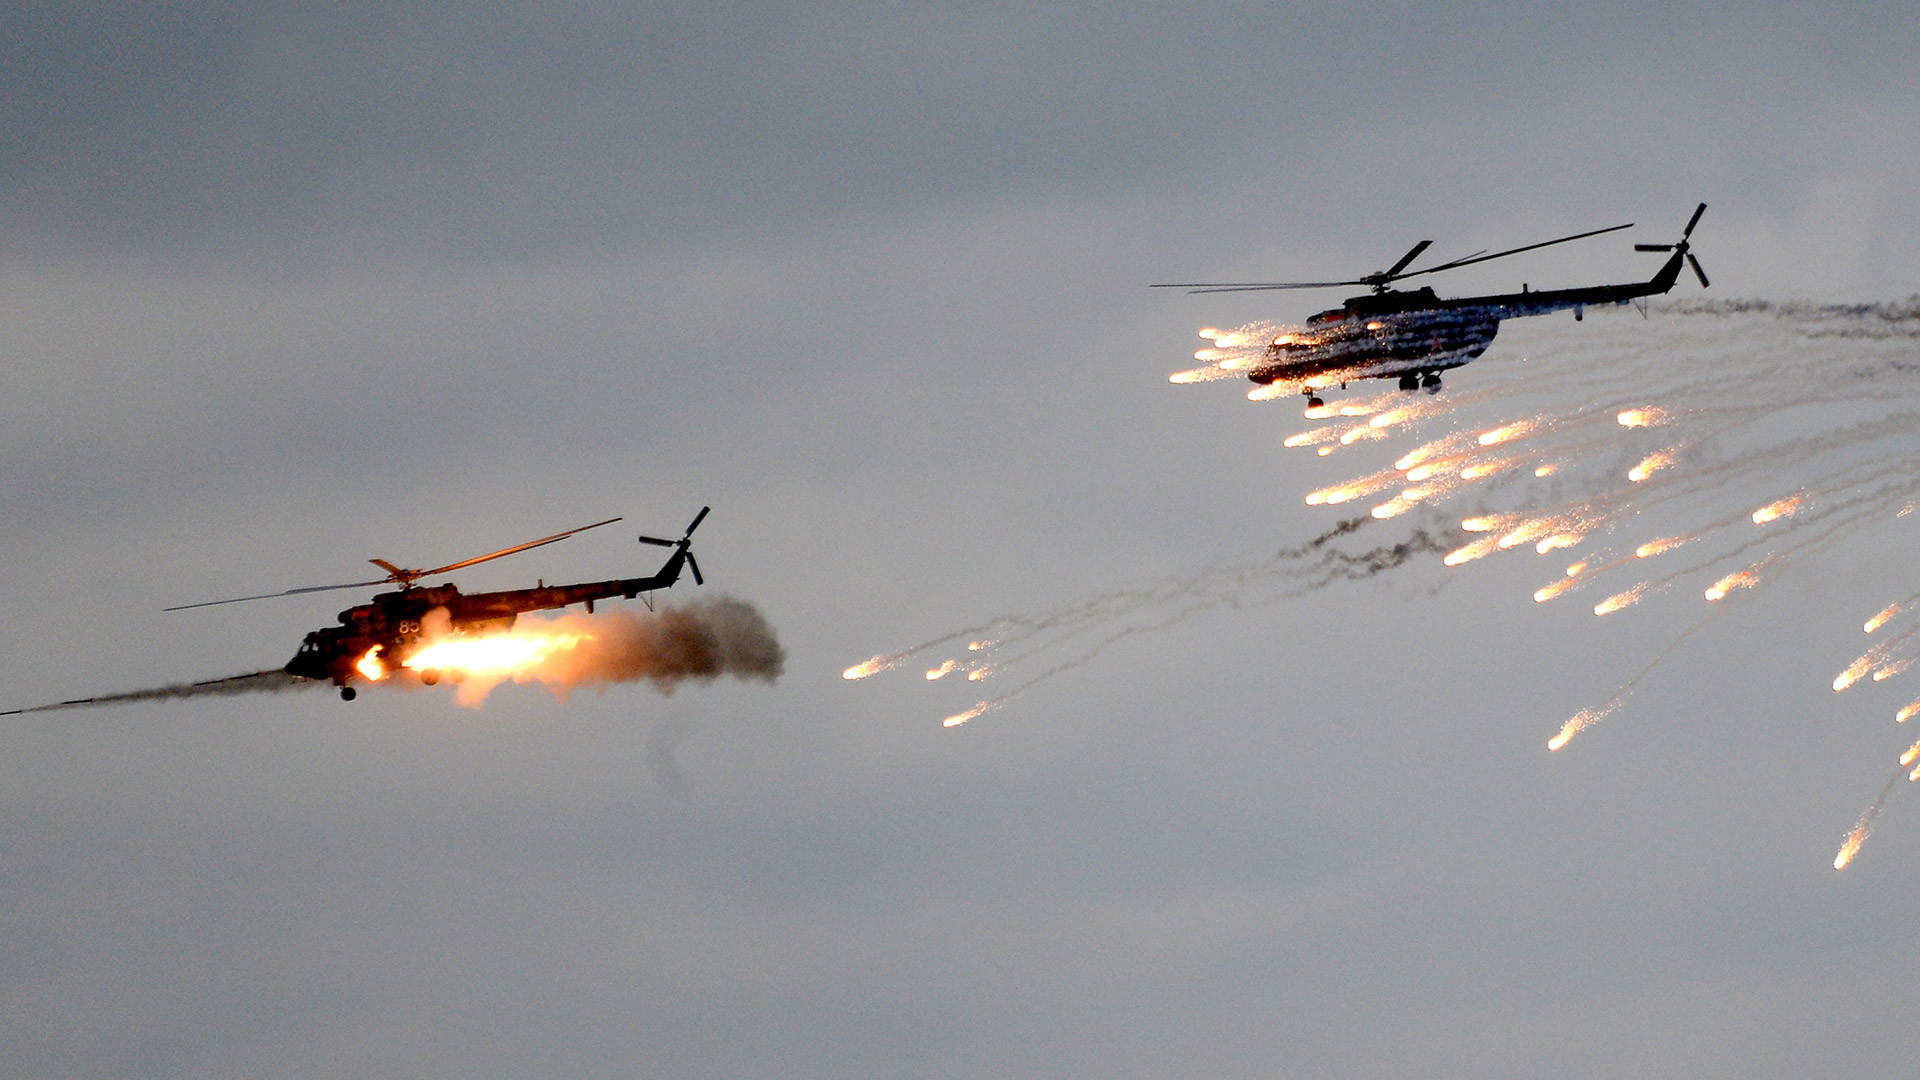 канске вертолеты с ракетами картинки снимке мужчина запечатлен